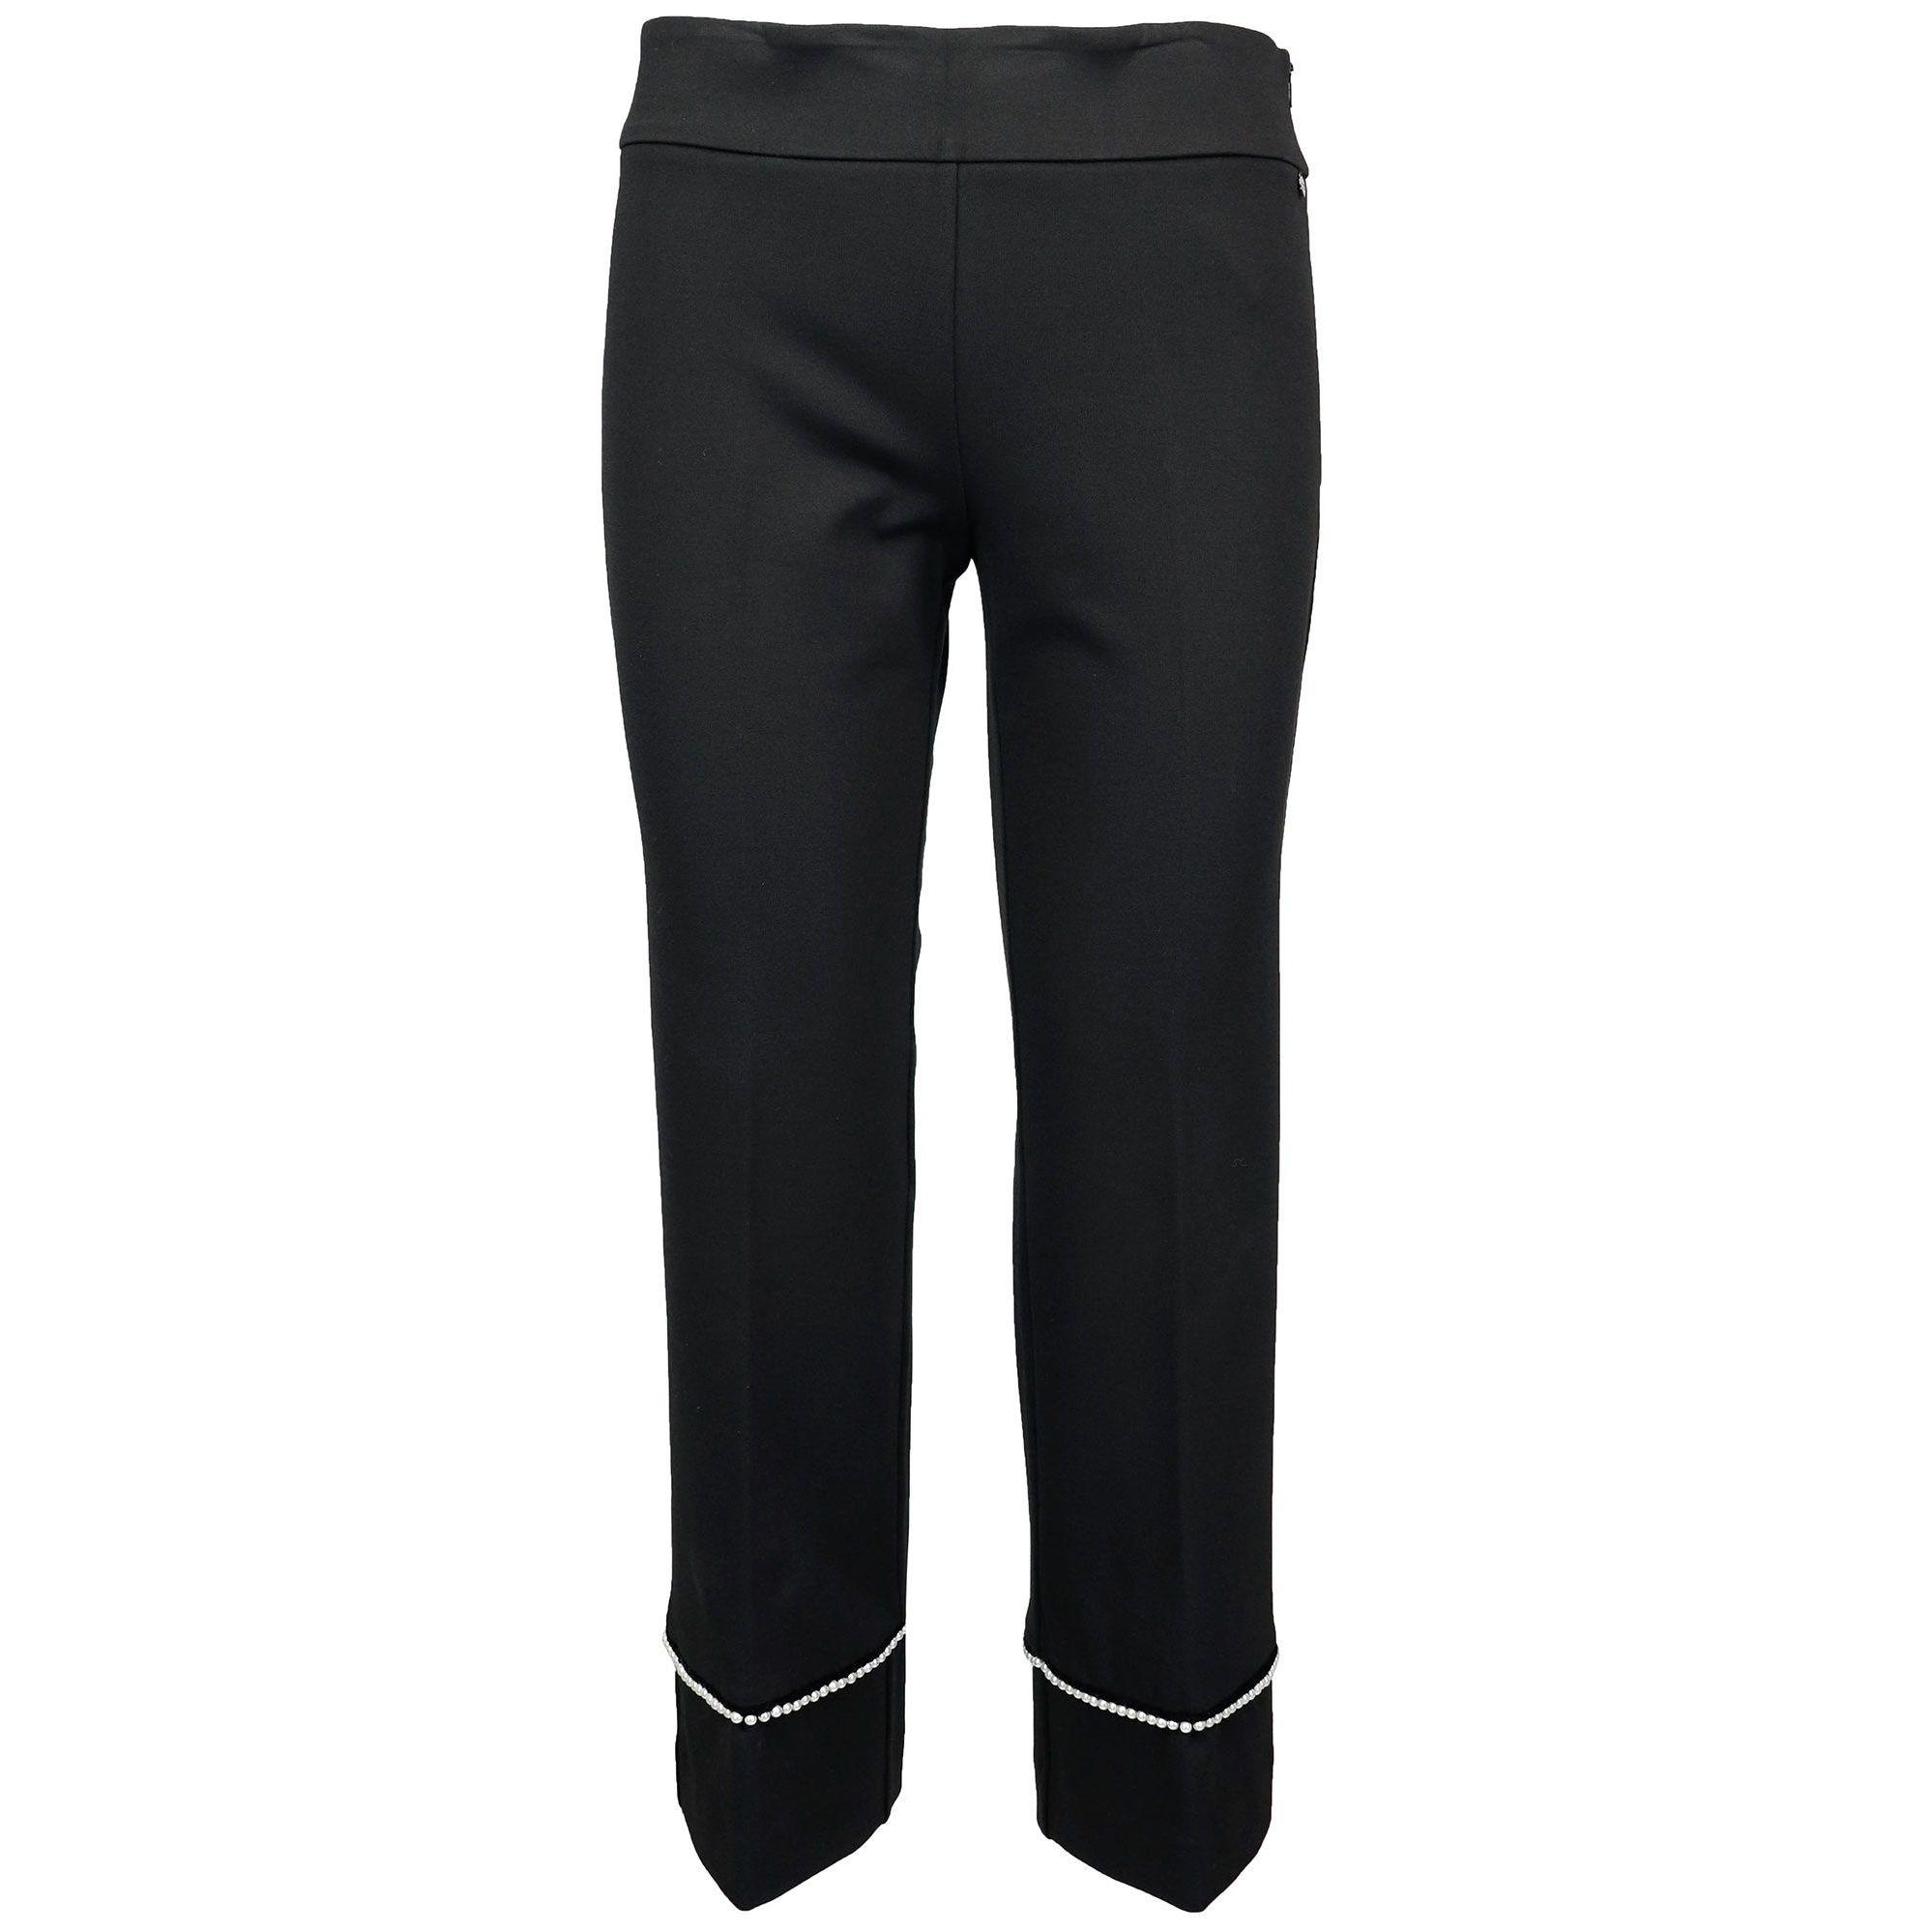 JEANS pantaloni slim stretch straight jeans a sigaretta STRASS 36 40